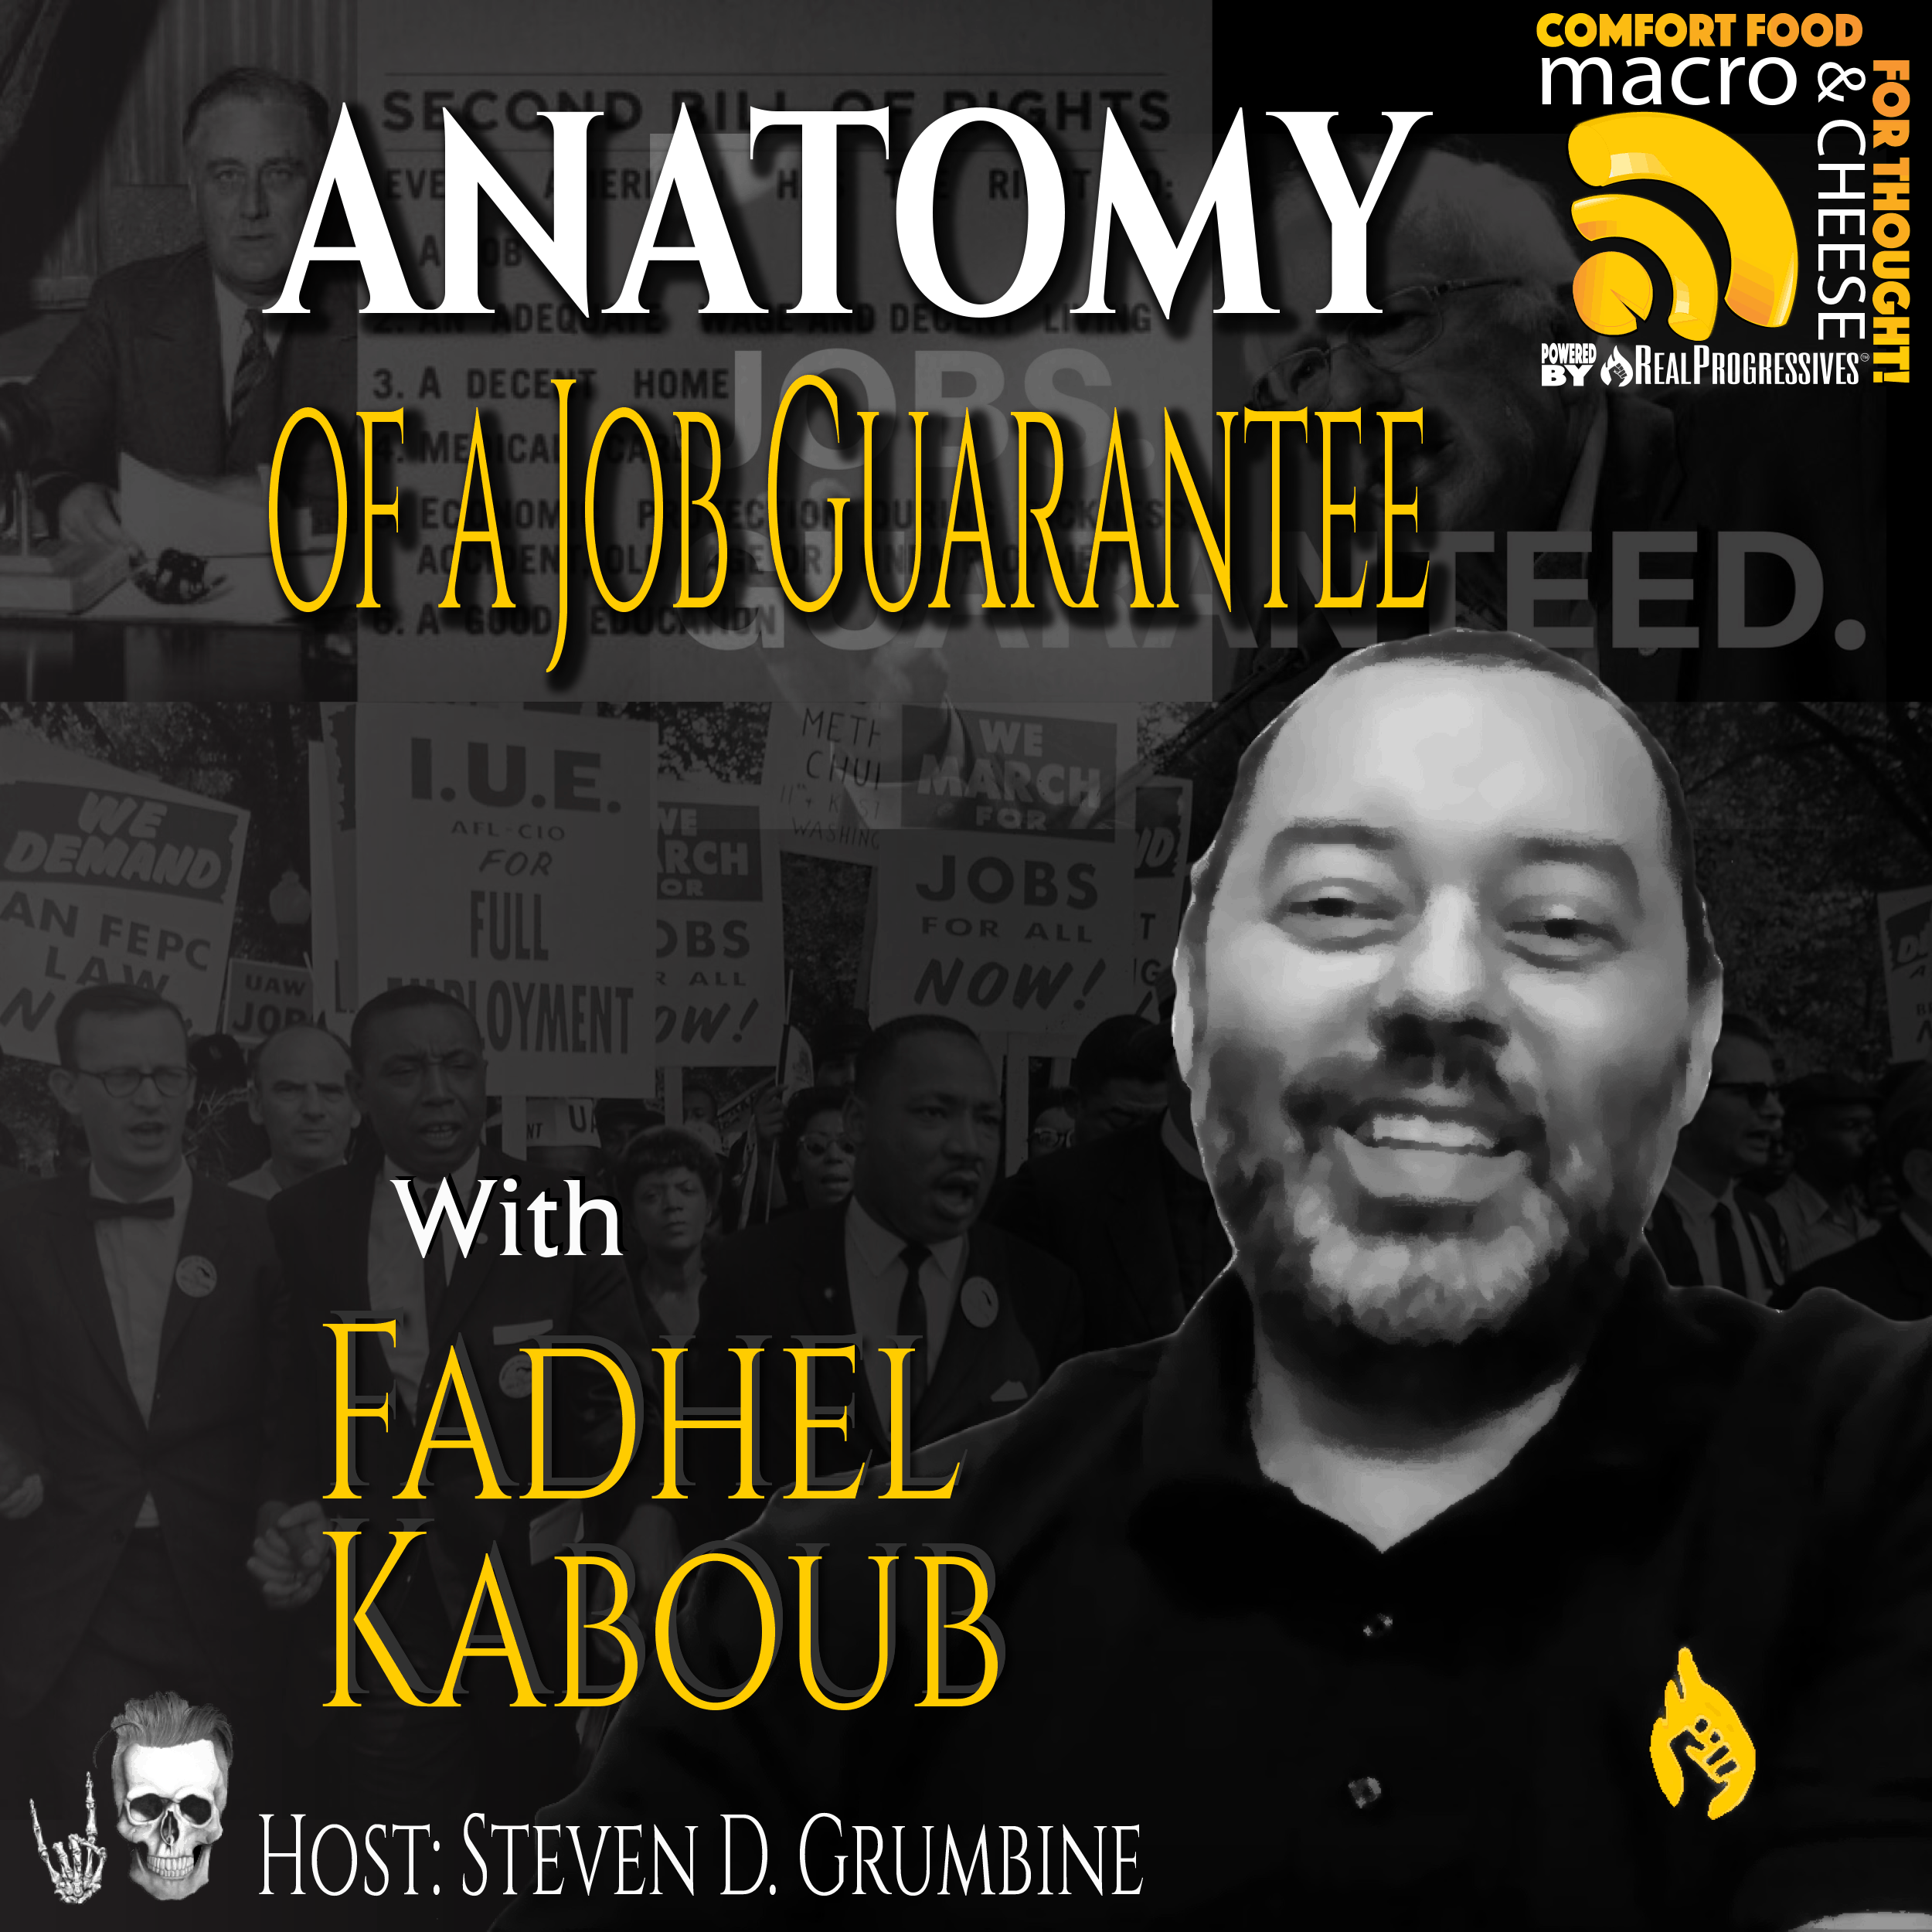 Episode 103 – Anatomy of a Job Guarantee with Fadhel Kaboub